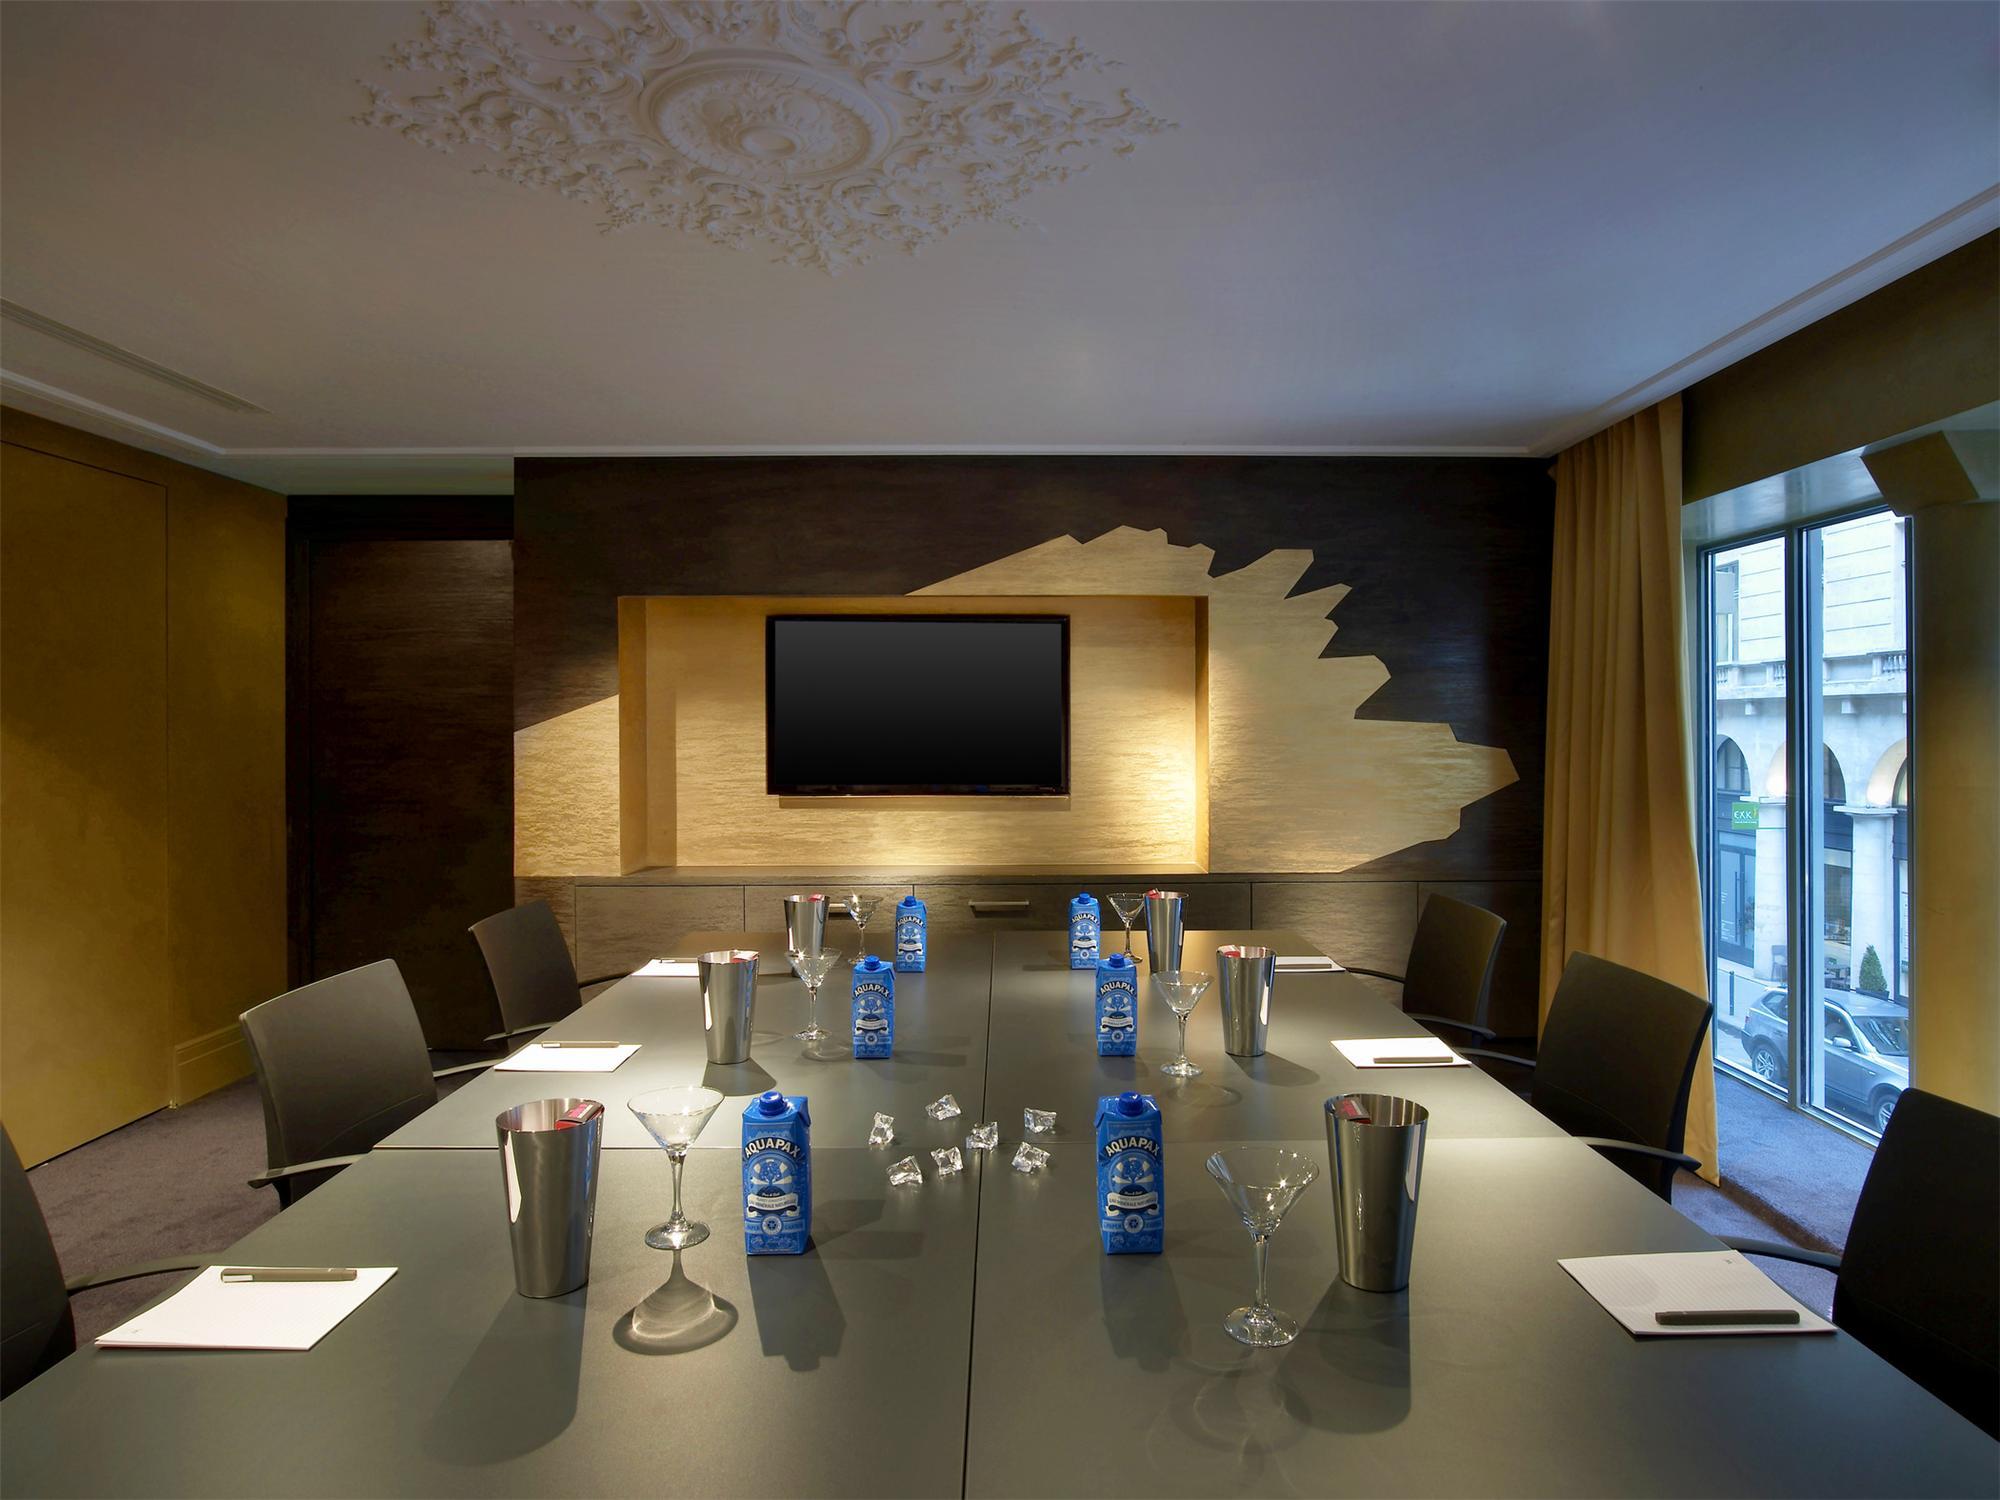 Studio Boardroom setup